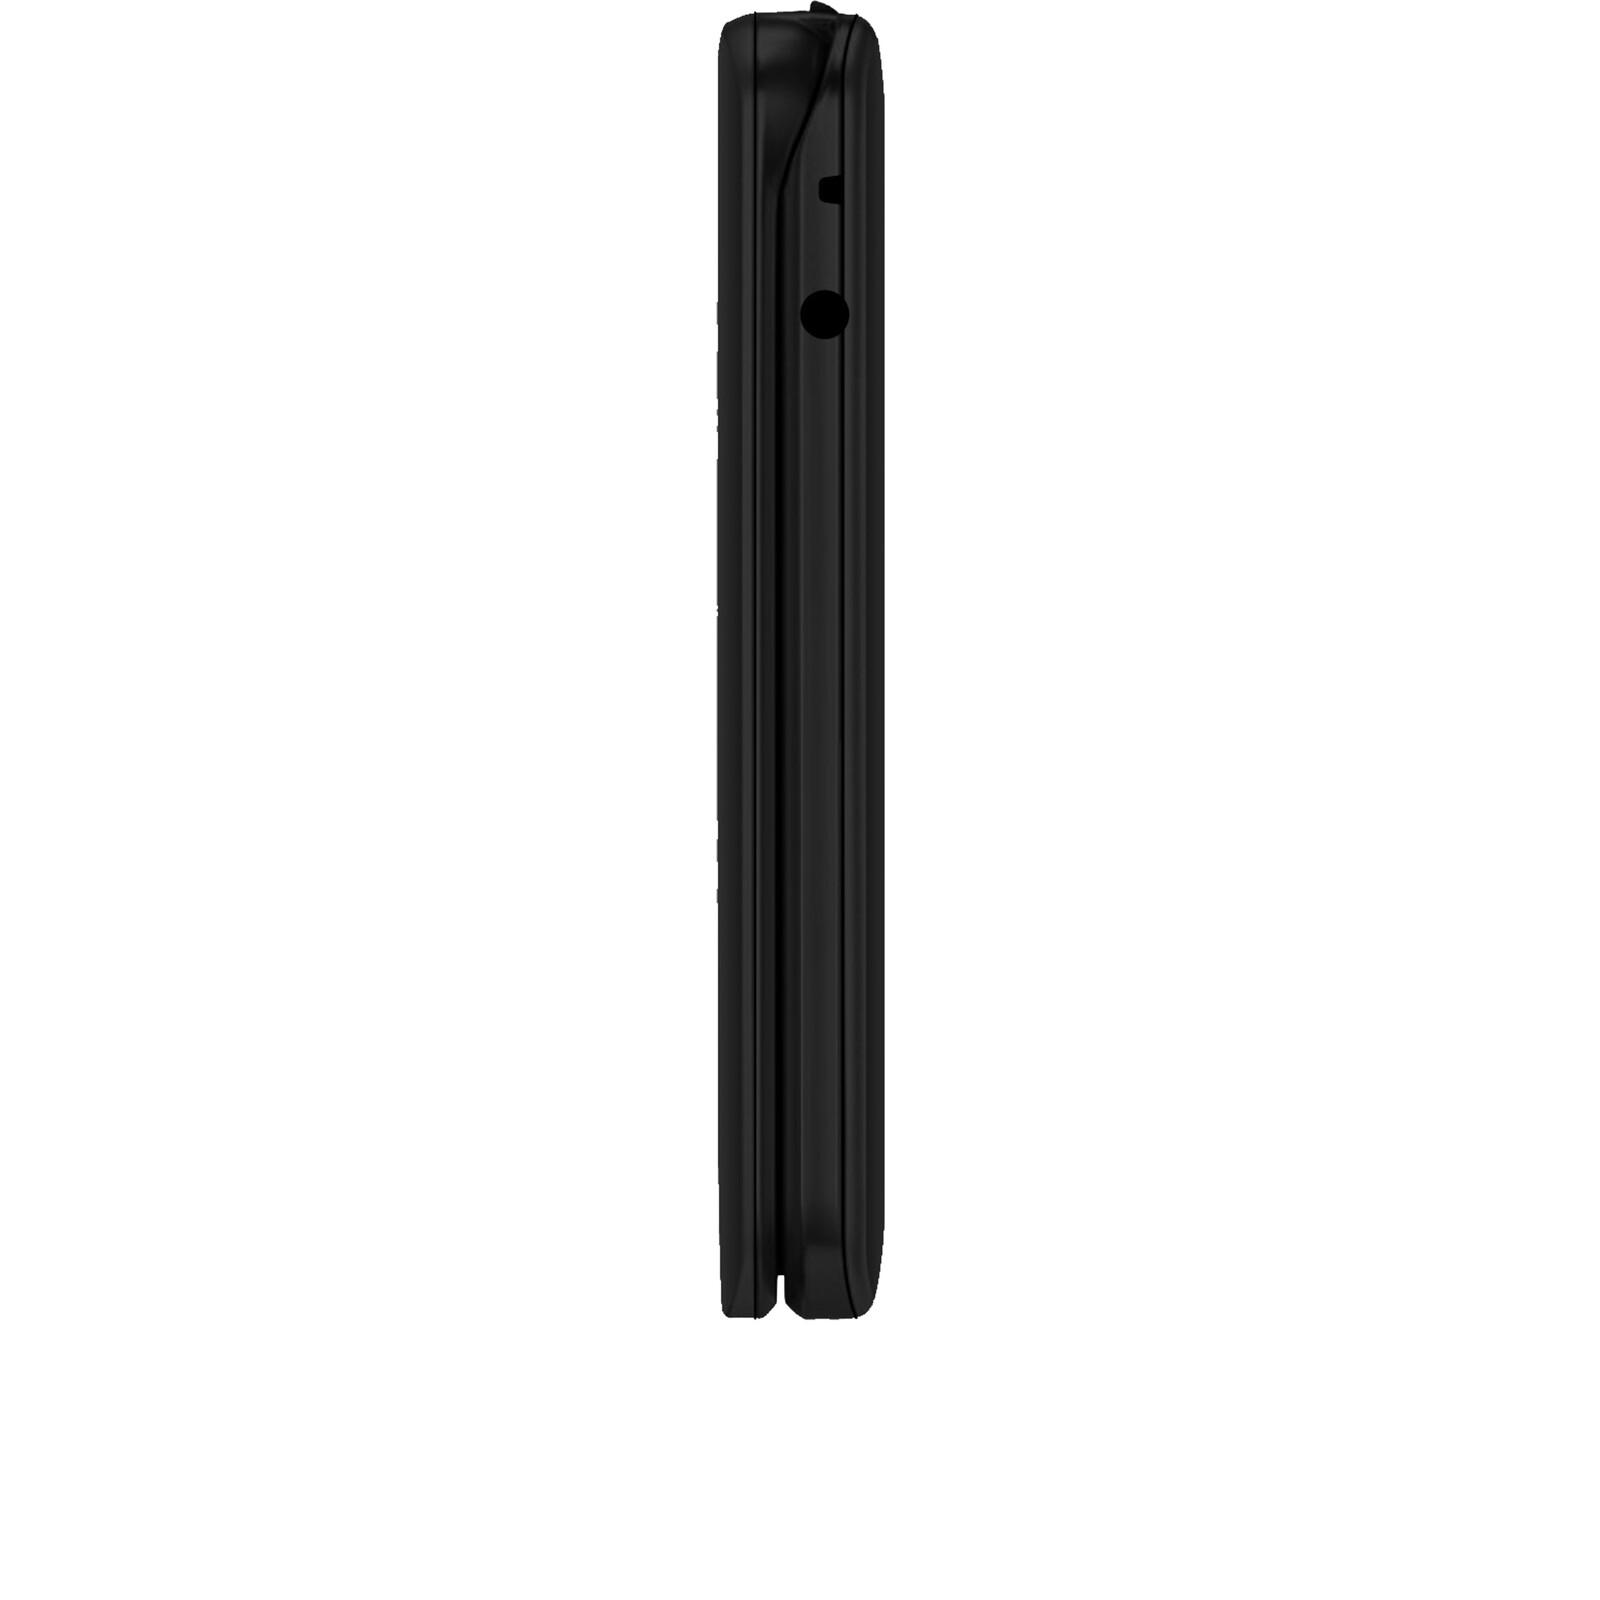 Beafon C400 black